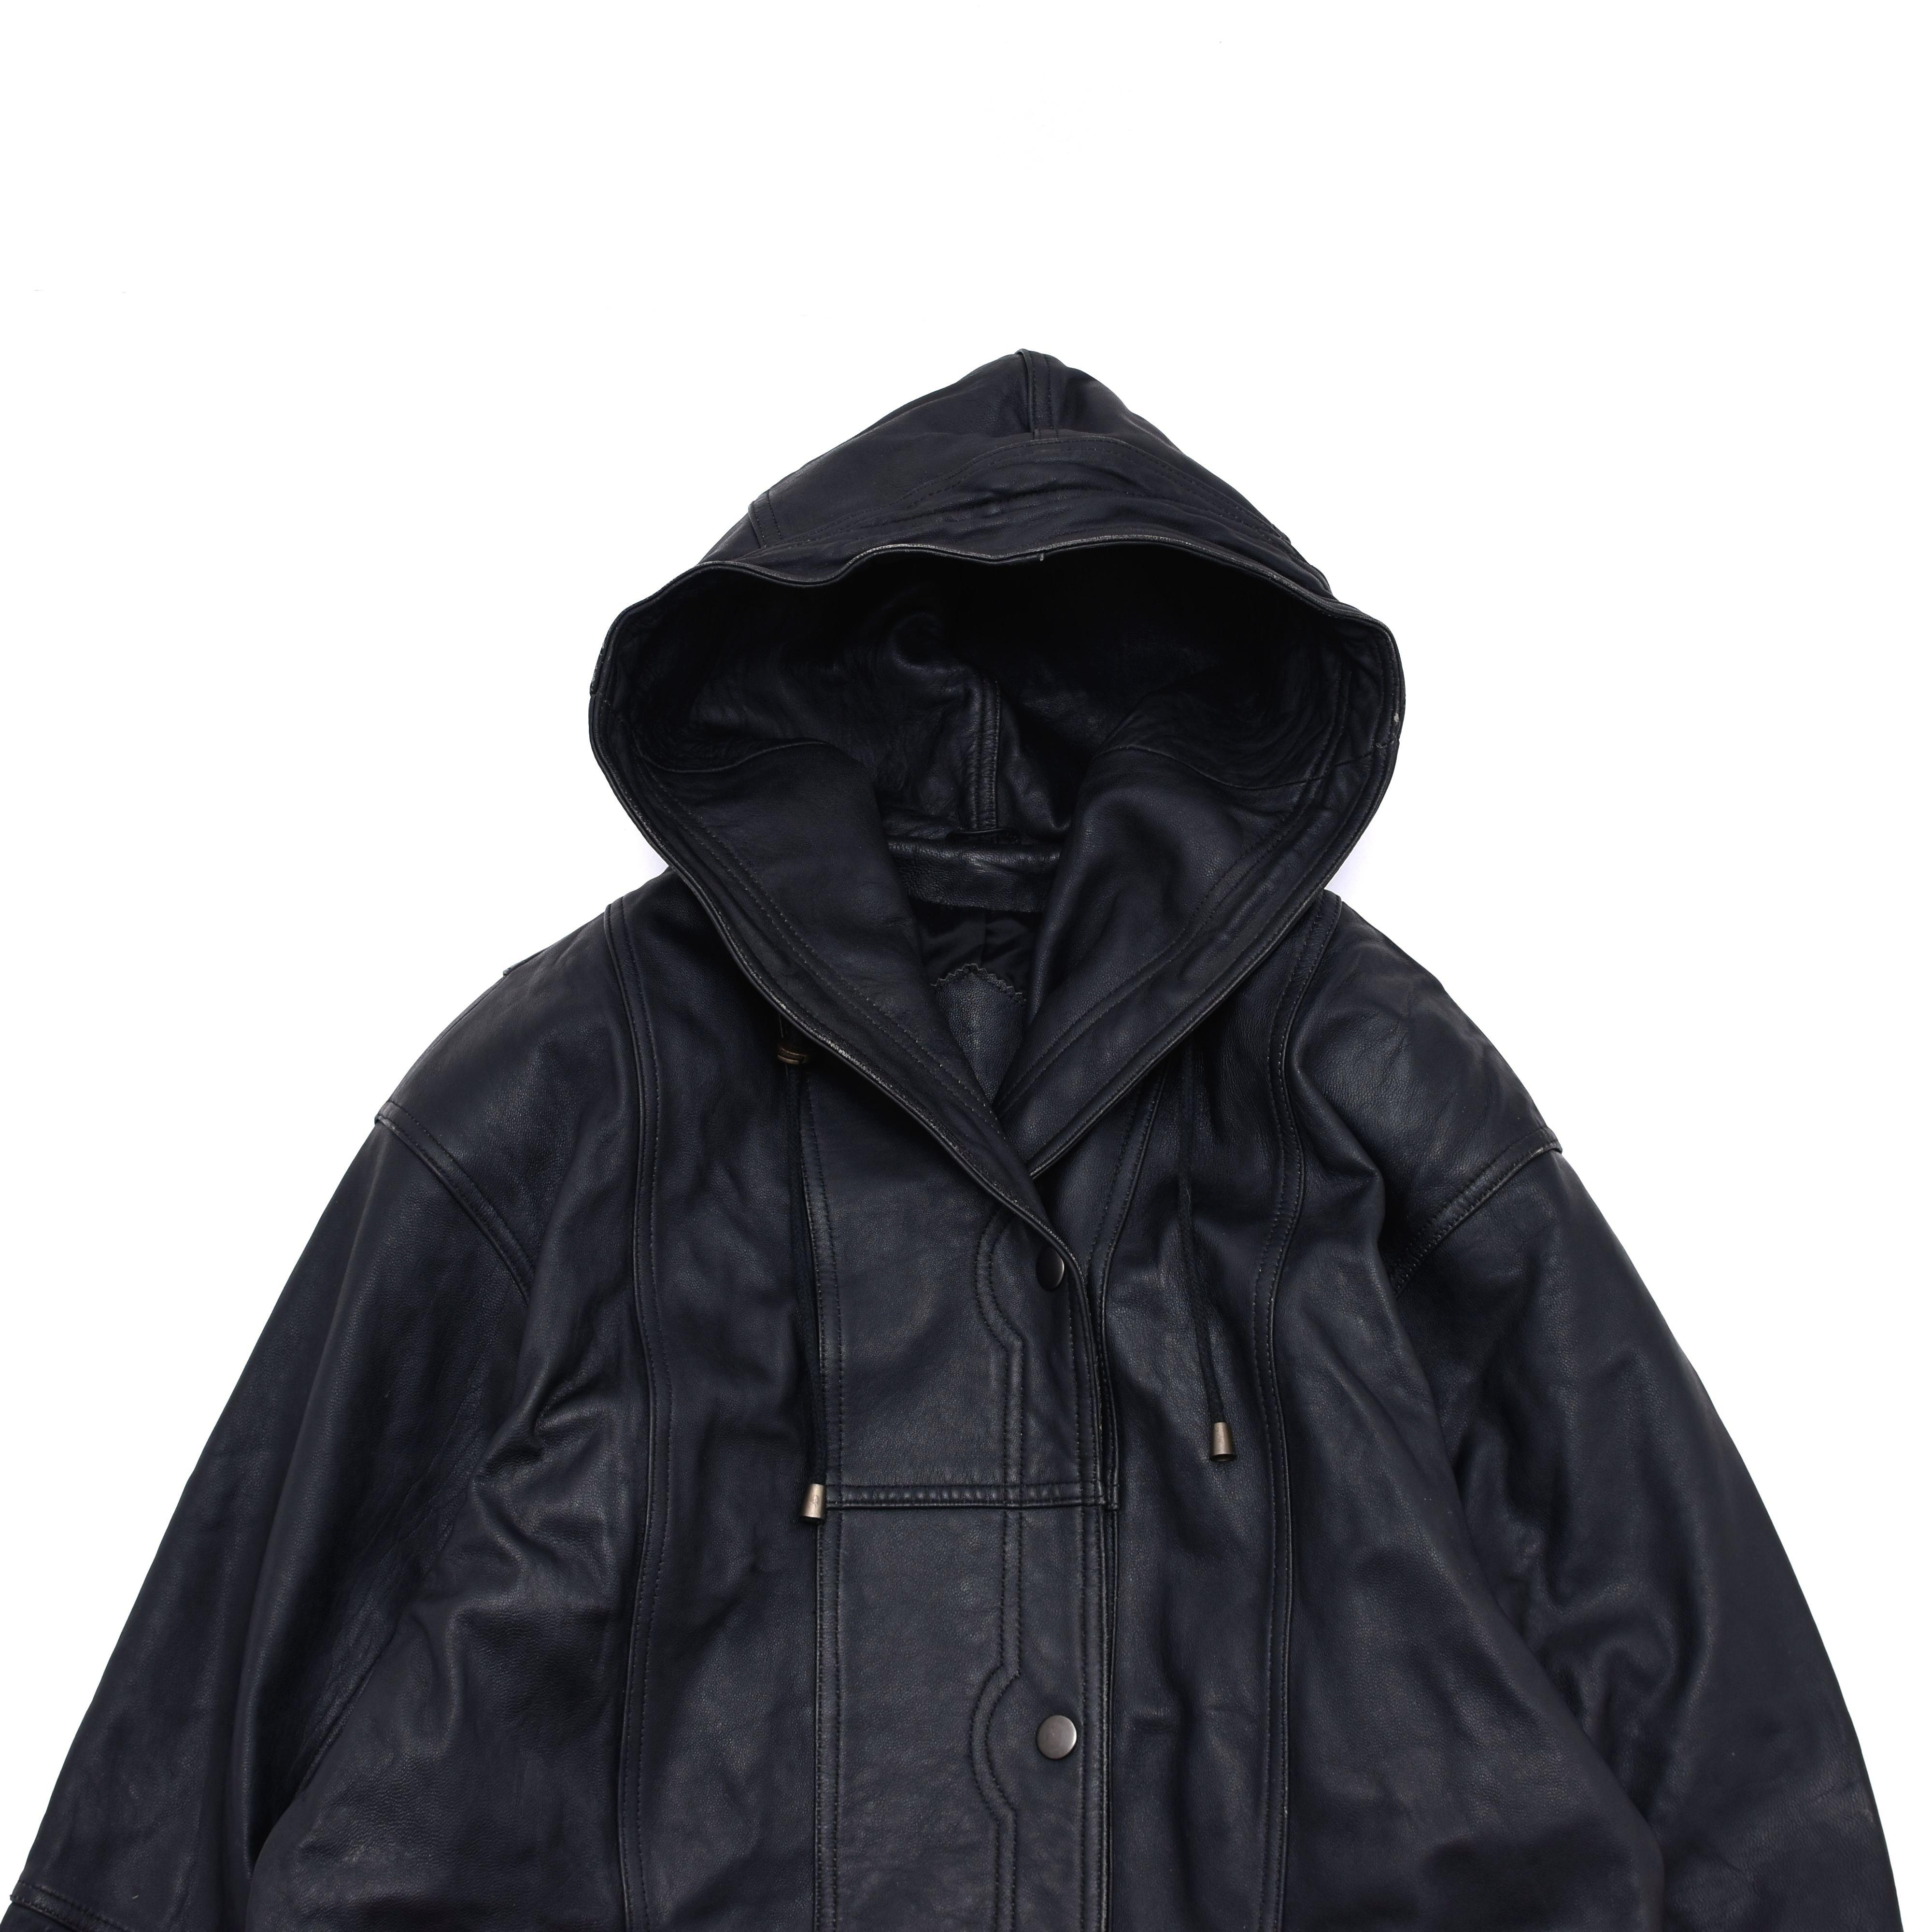 Unisex black leather hoodie coat